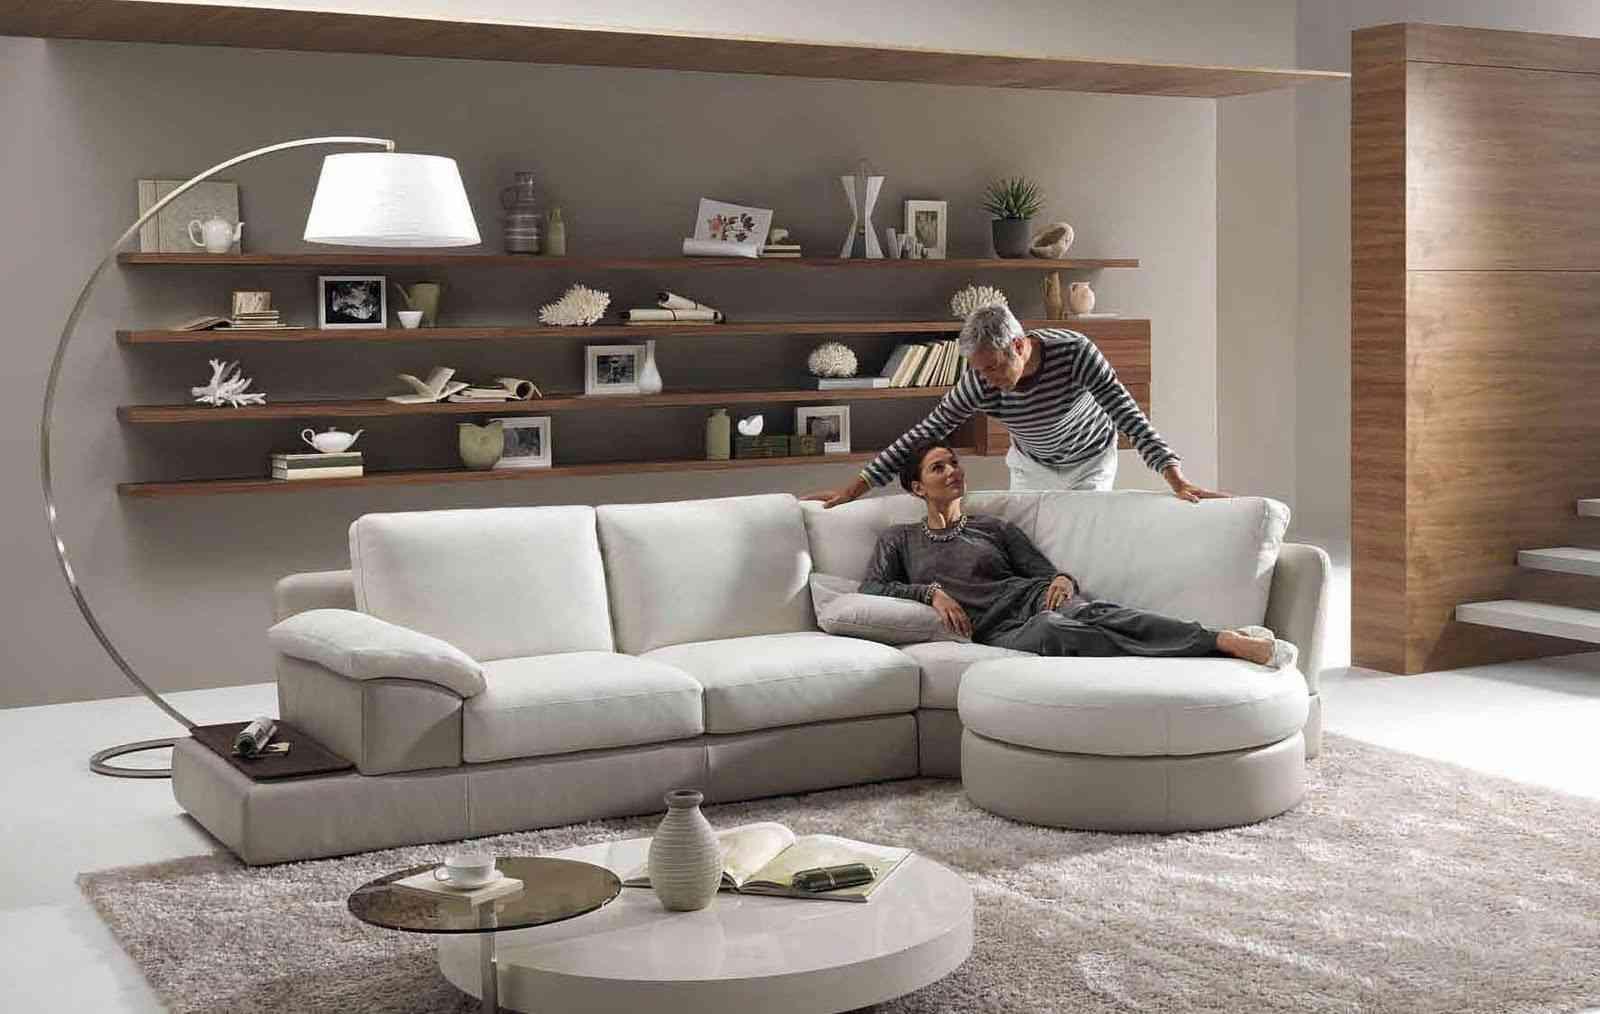 Lmparas prcticas para tu saln o sala de estar